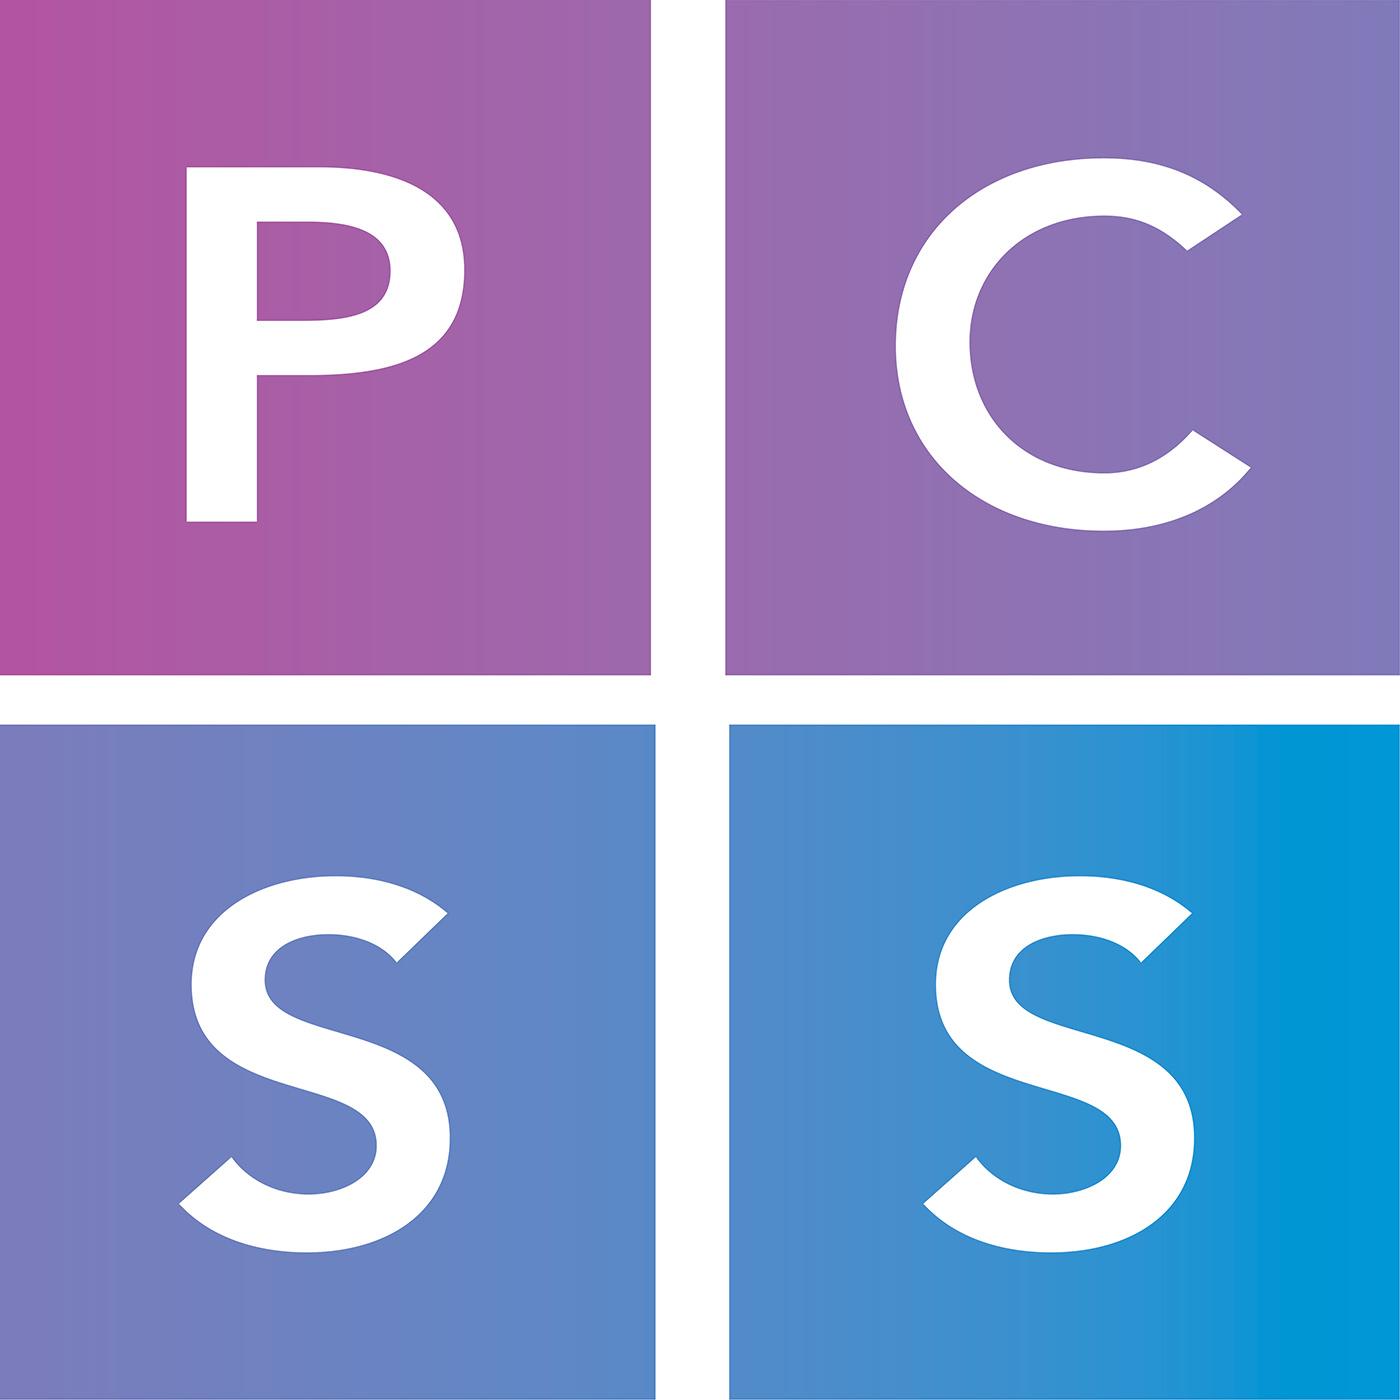 PCSS Podcast show art